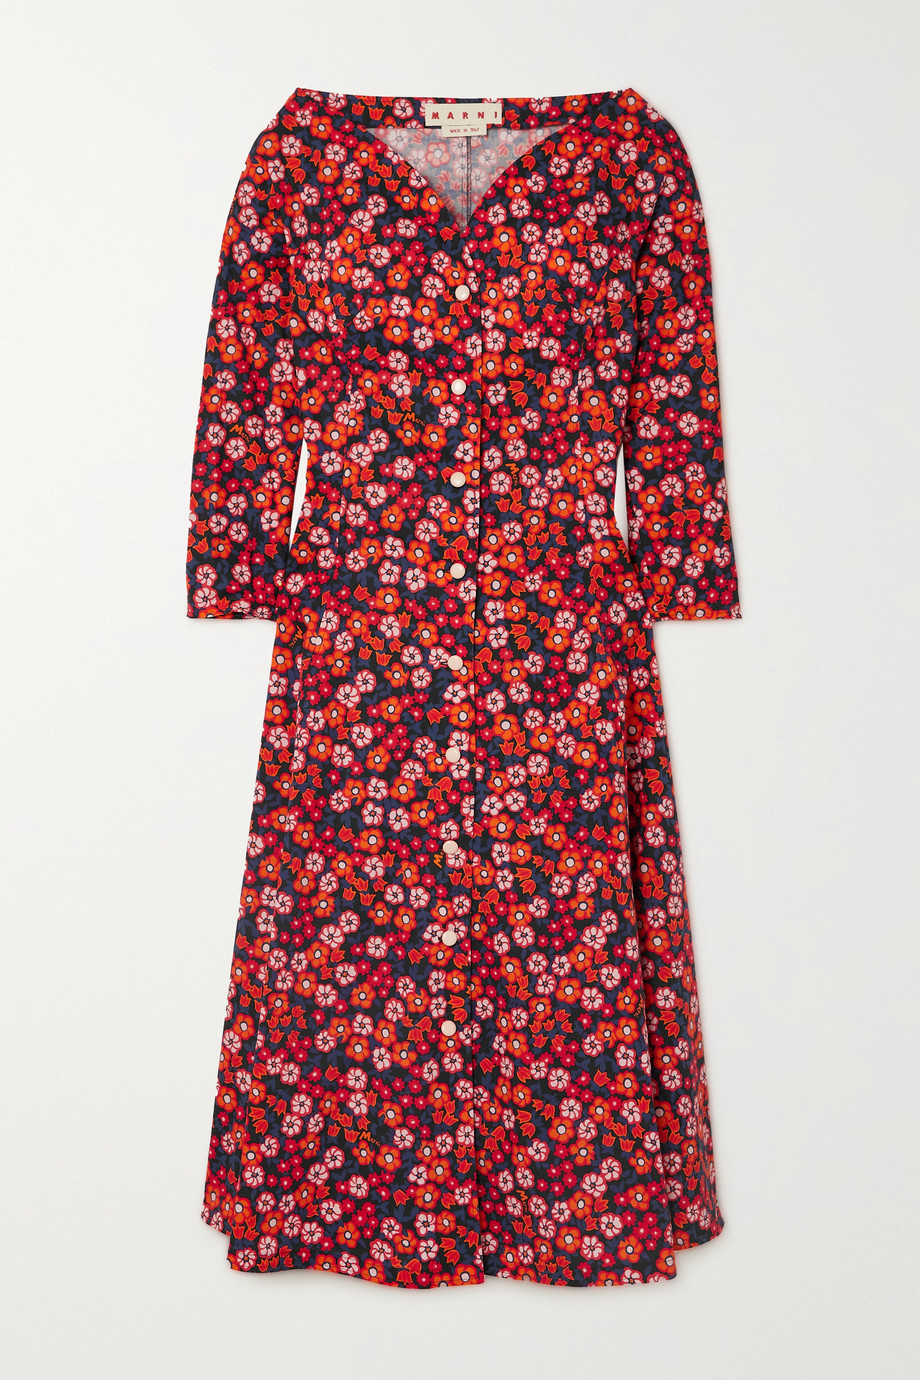 Marni Pop Garden floral-print cotton-poplin midi dress